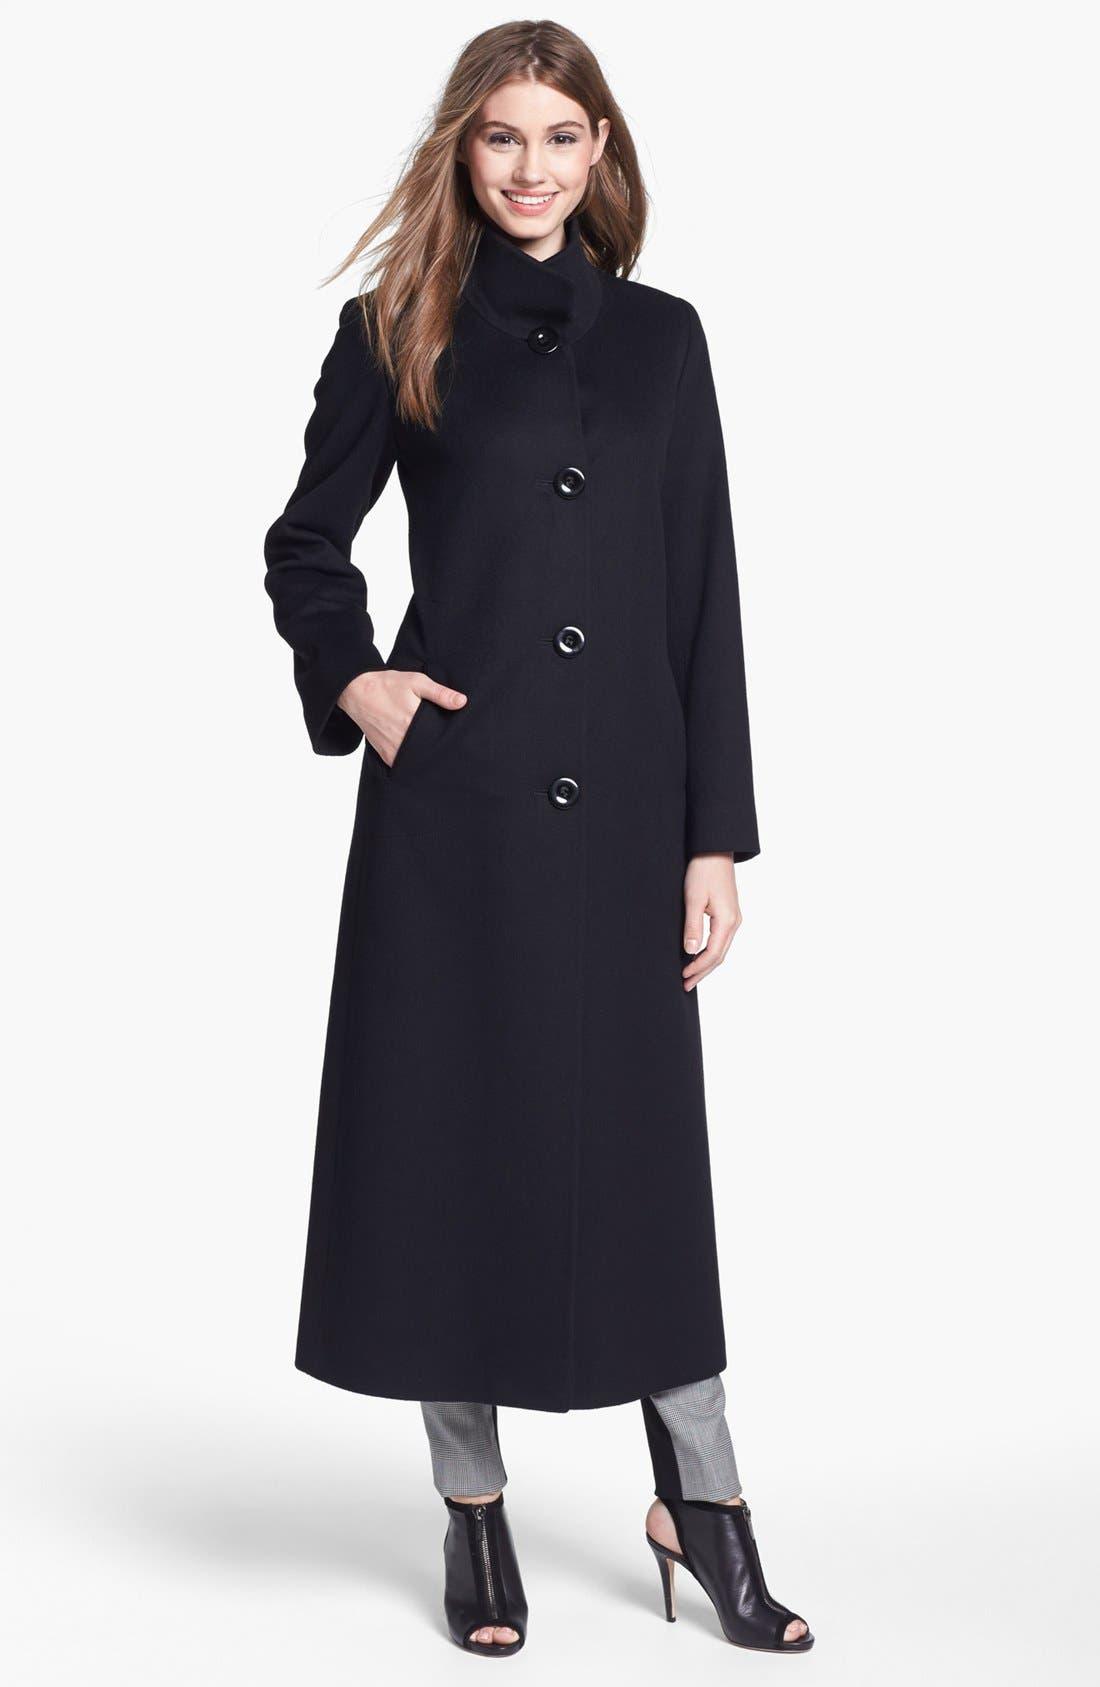 Main Image - Fleurette Stand Collar Cashmere Coat